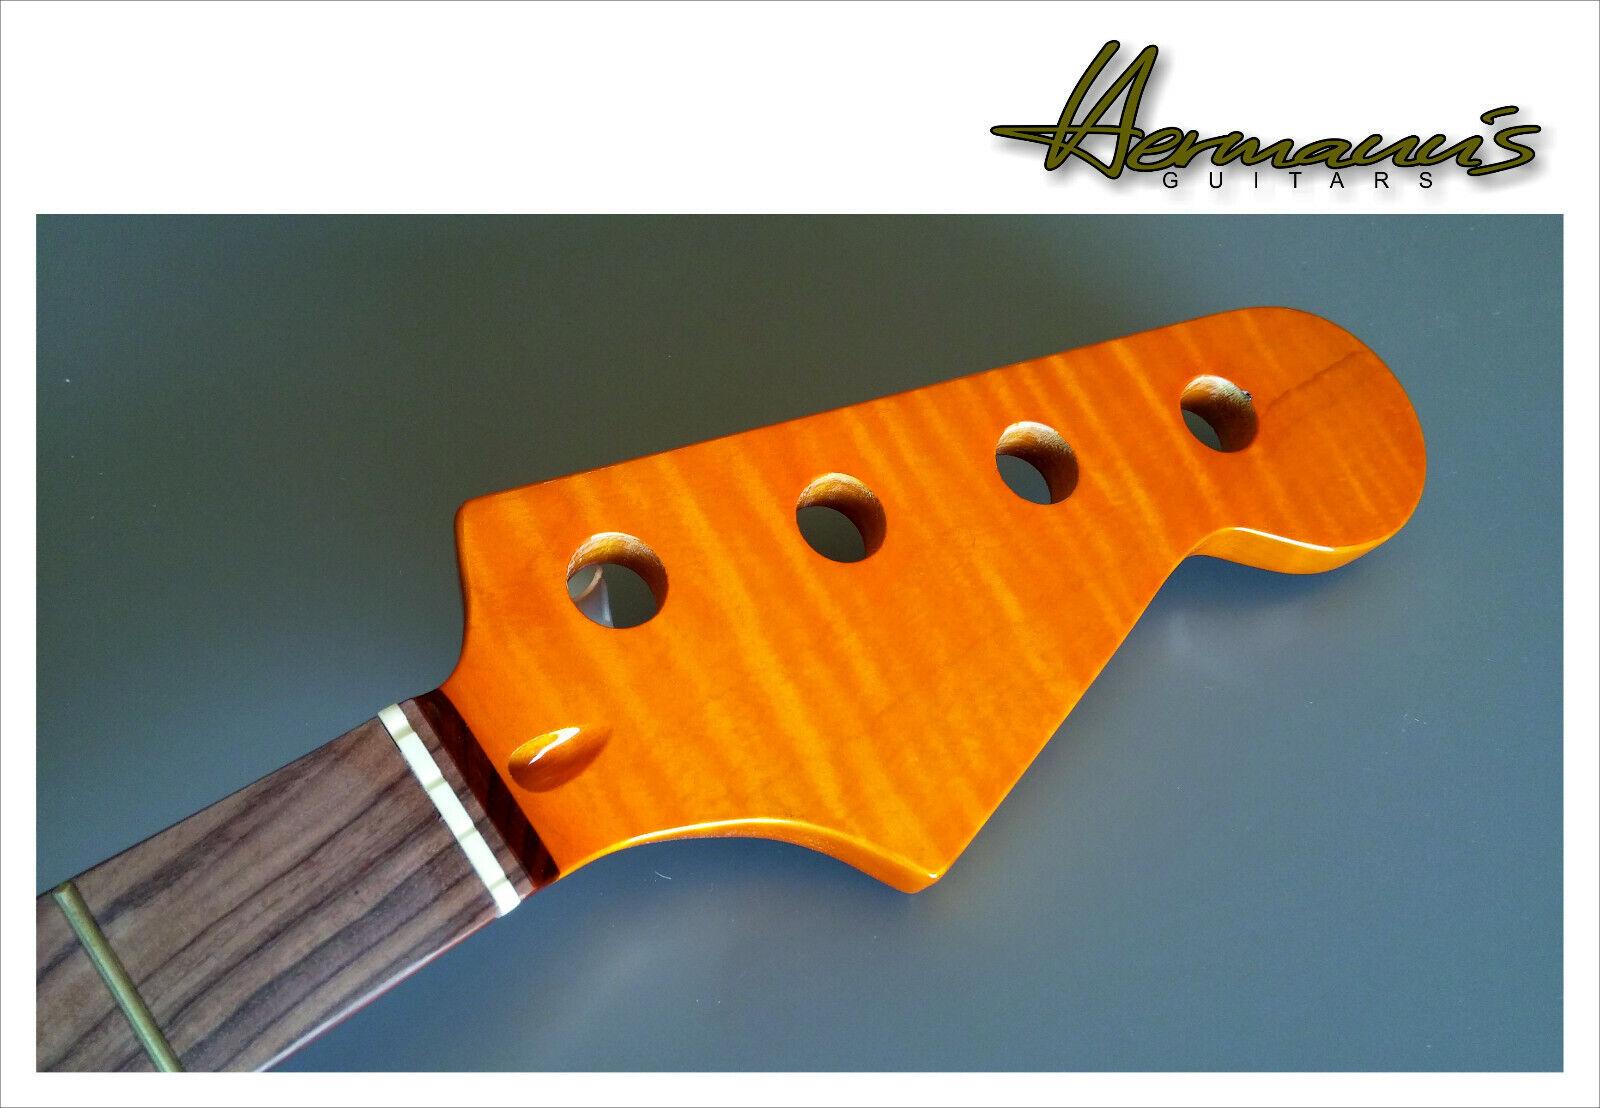 Jazz Bass Canadian Tiger Flamed Maple Neck High Quality Neck Pau Ferro Board